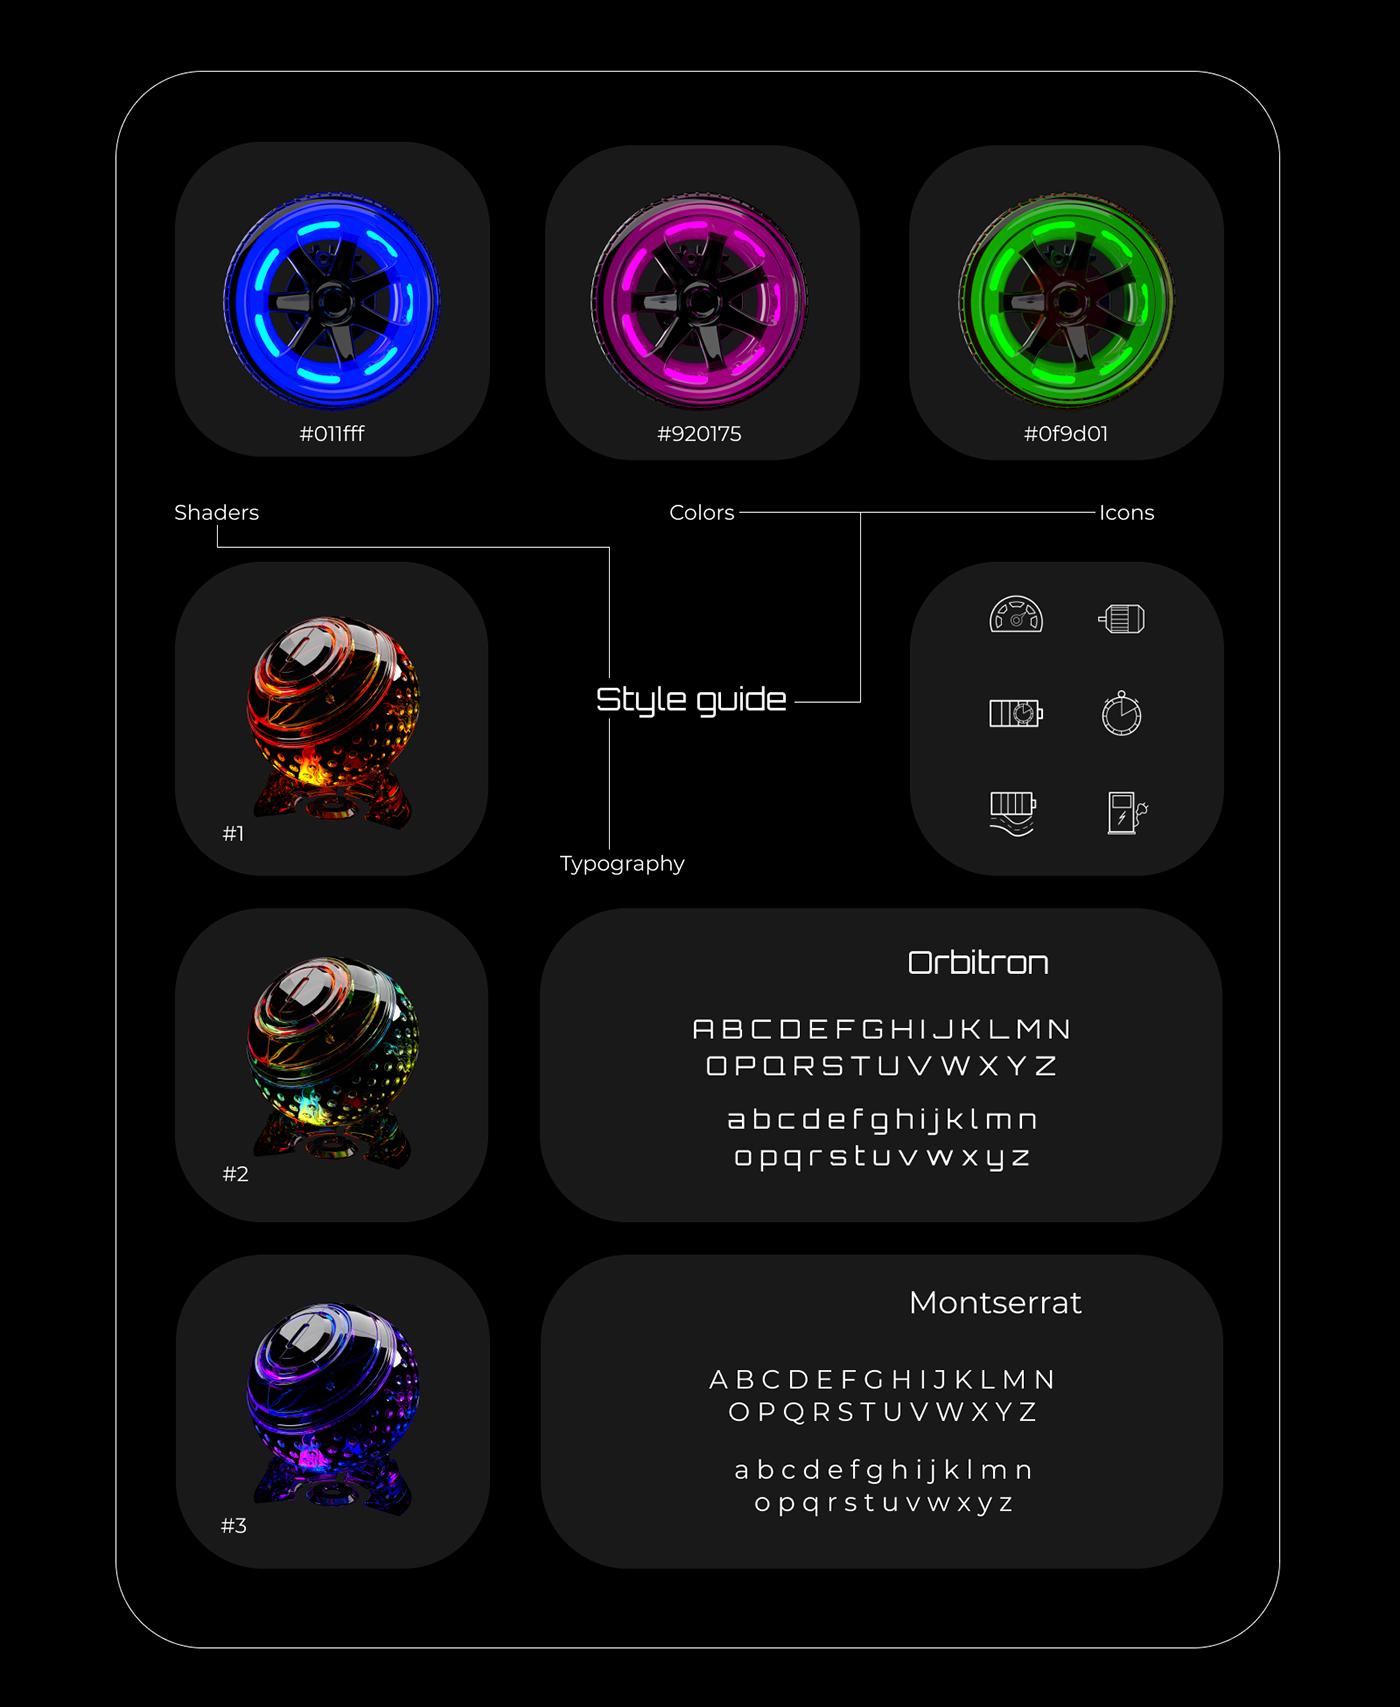 3D,after effects,design,graphic design ,ILLUSTRATION ,Mobile app,photoshop,redshift,ui ux,Vizualization